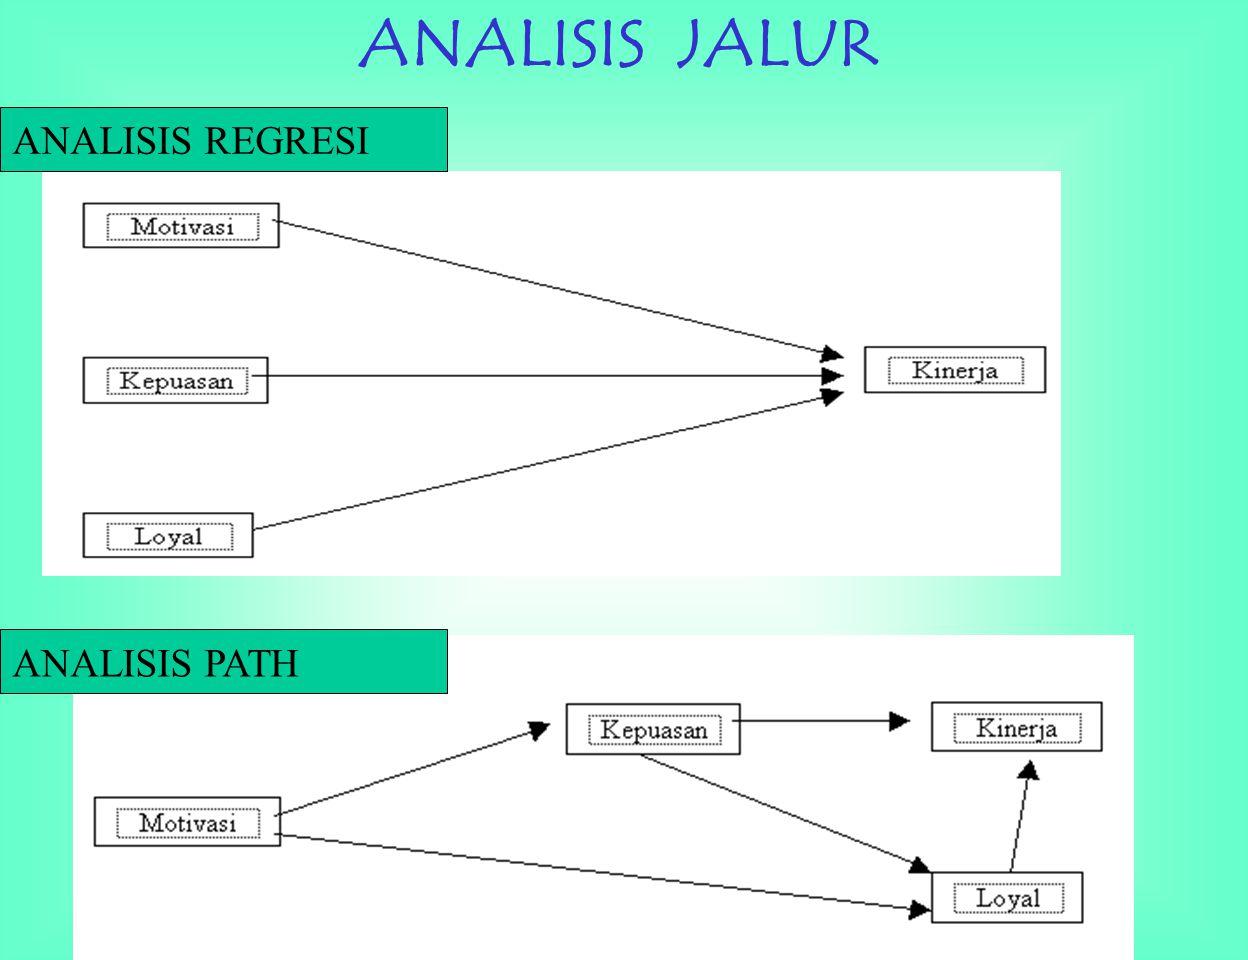 Analisis korelasi dapat digunakan untuk mengetahui tingkat keeratan hubungan antar variabel, kita dapat melakukan prediksi (secara kualitatif) apa yan